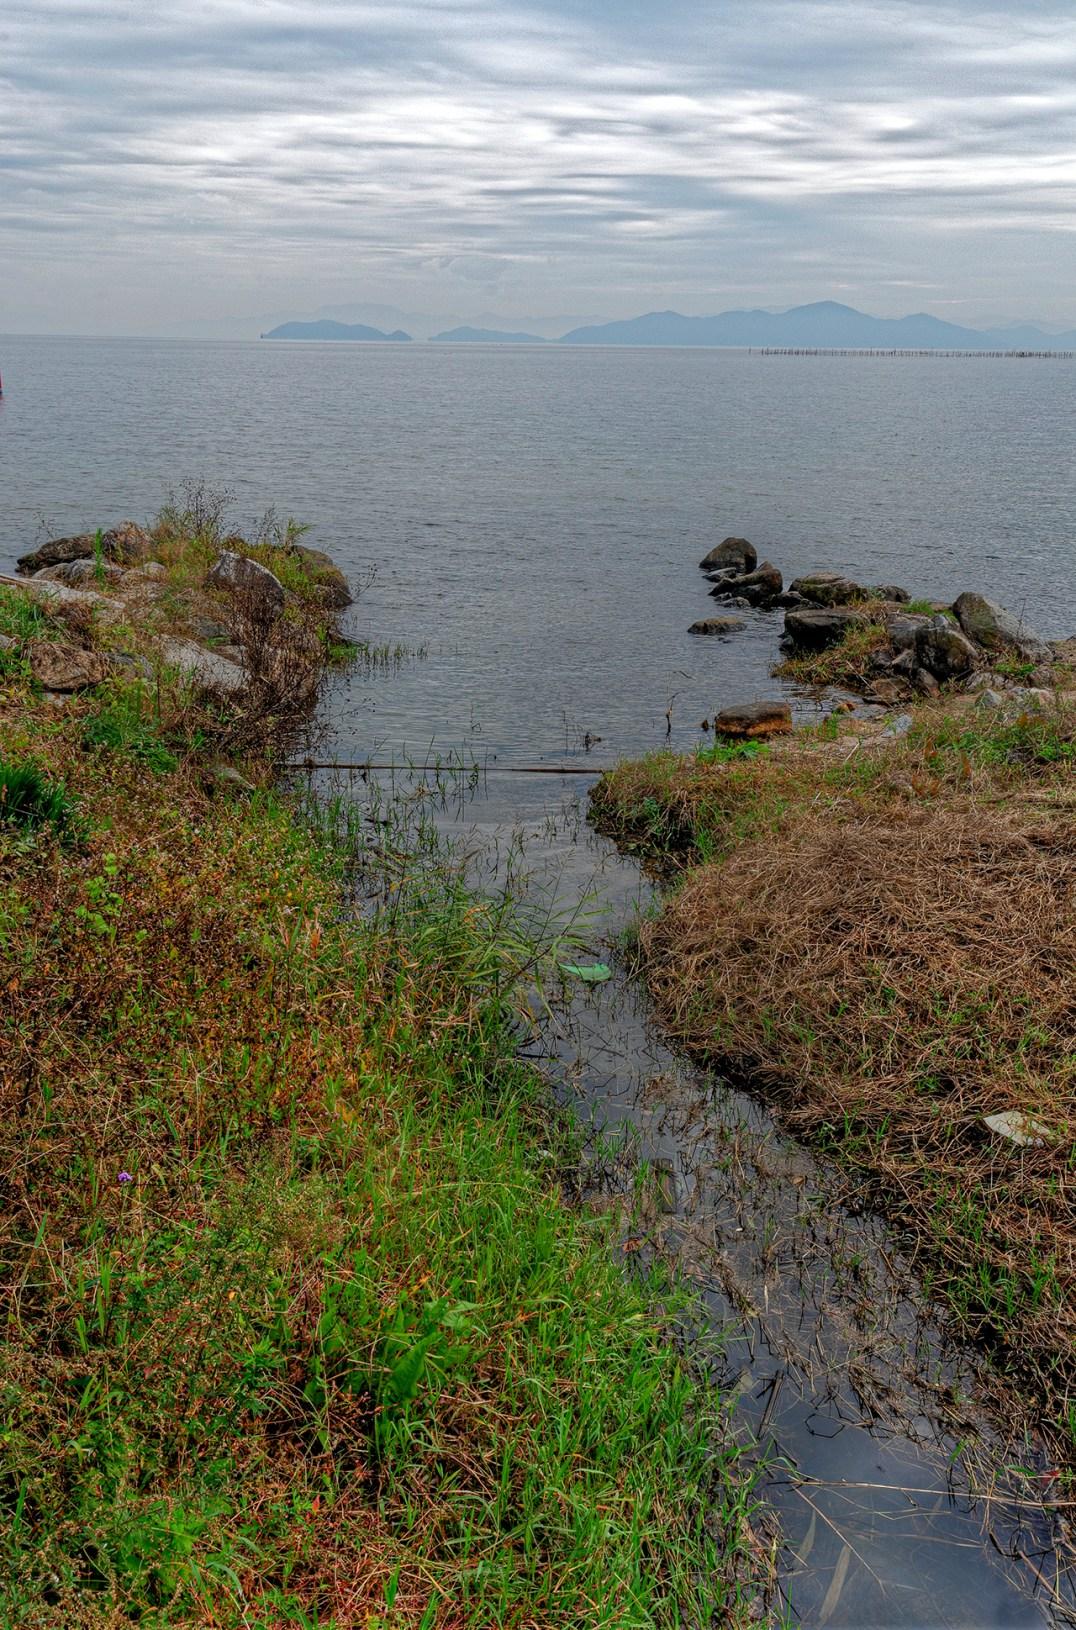 Across Lake Biwa, Japan